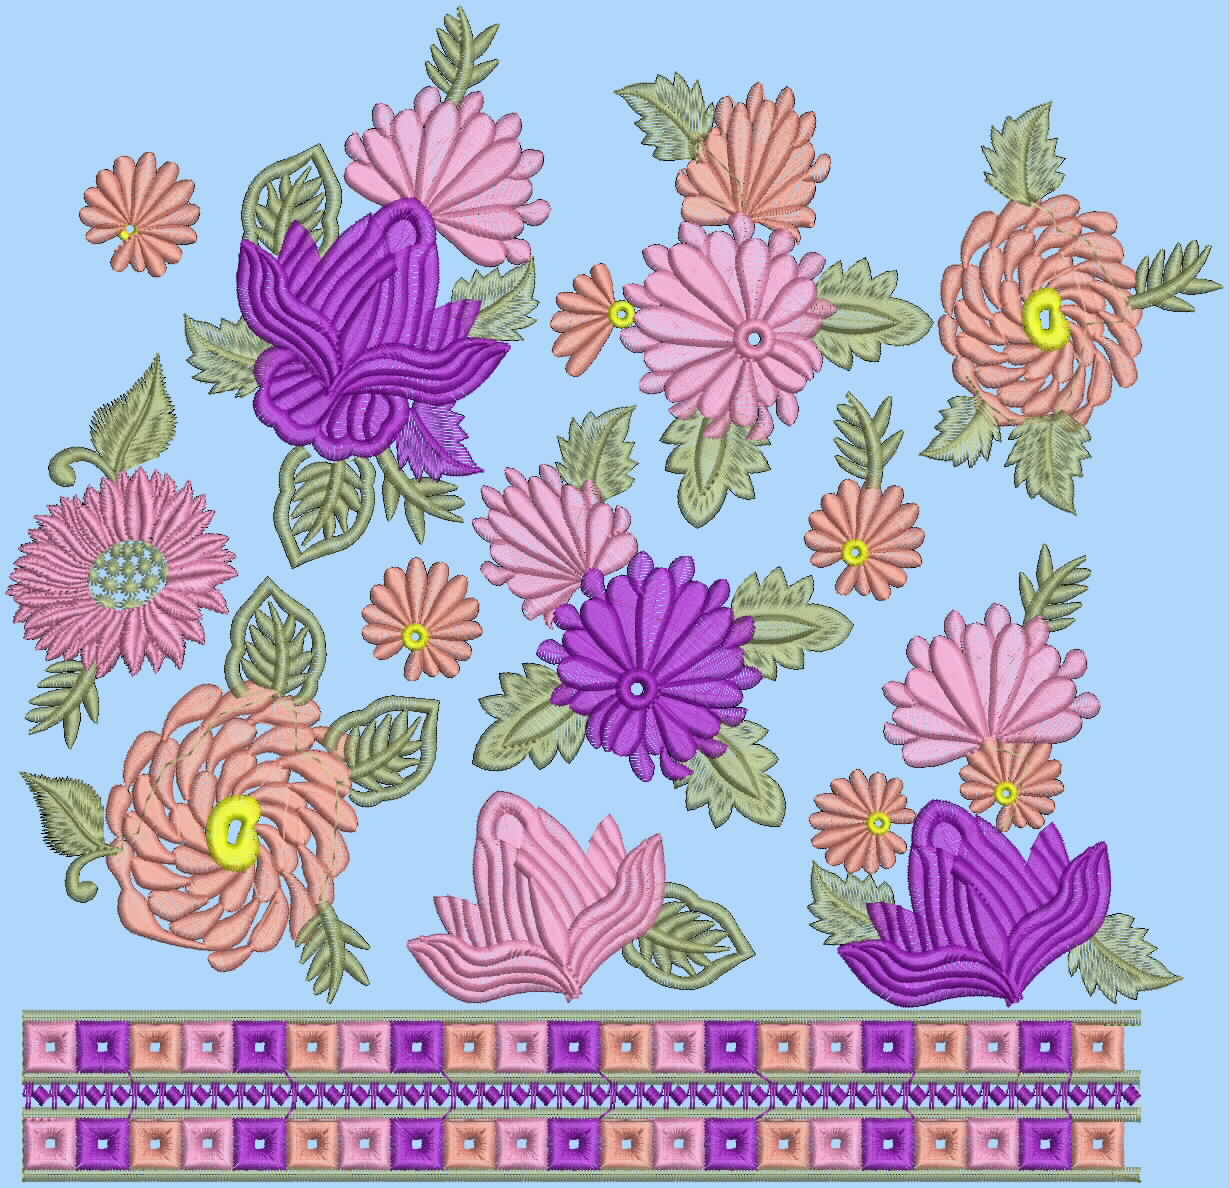 كل الرشمات جميلة Embroidery+designs+suits